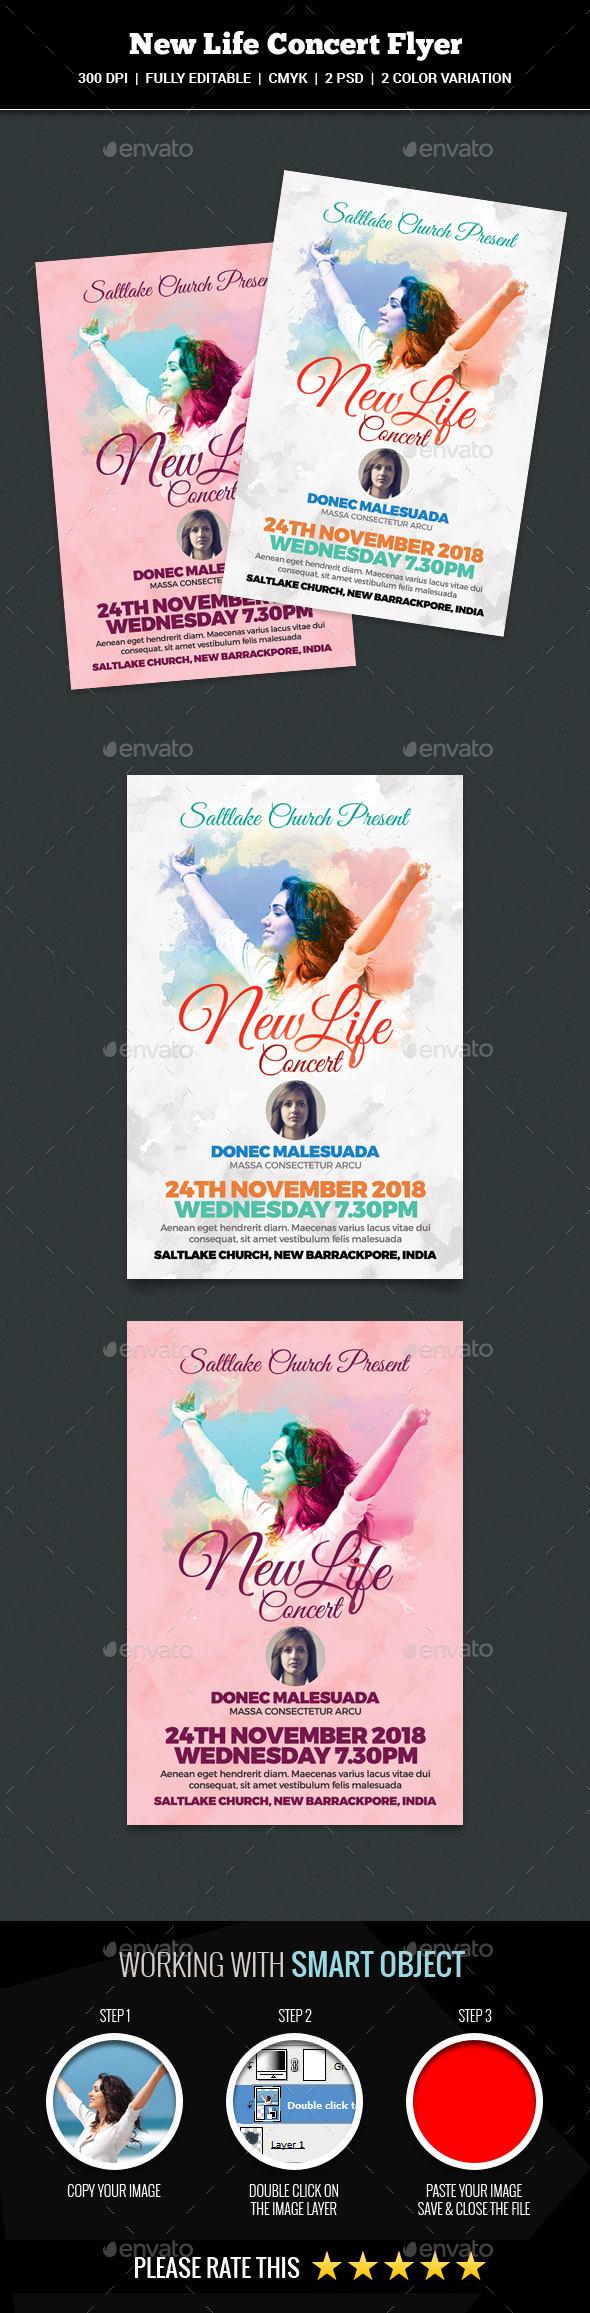 New Life Concert Flyer - Church Flyers